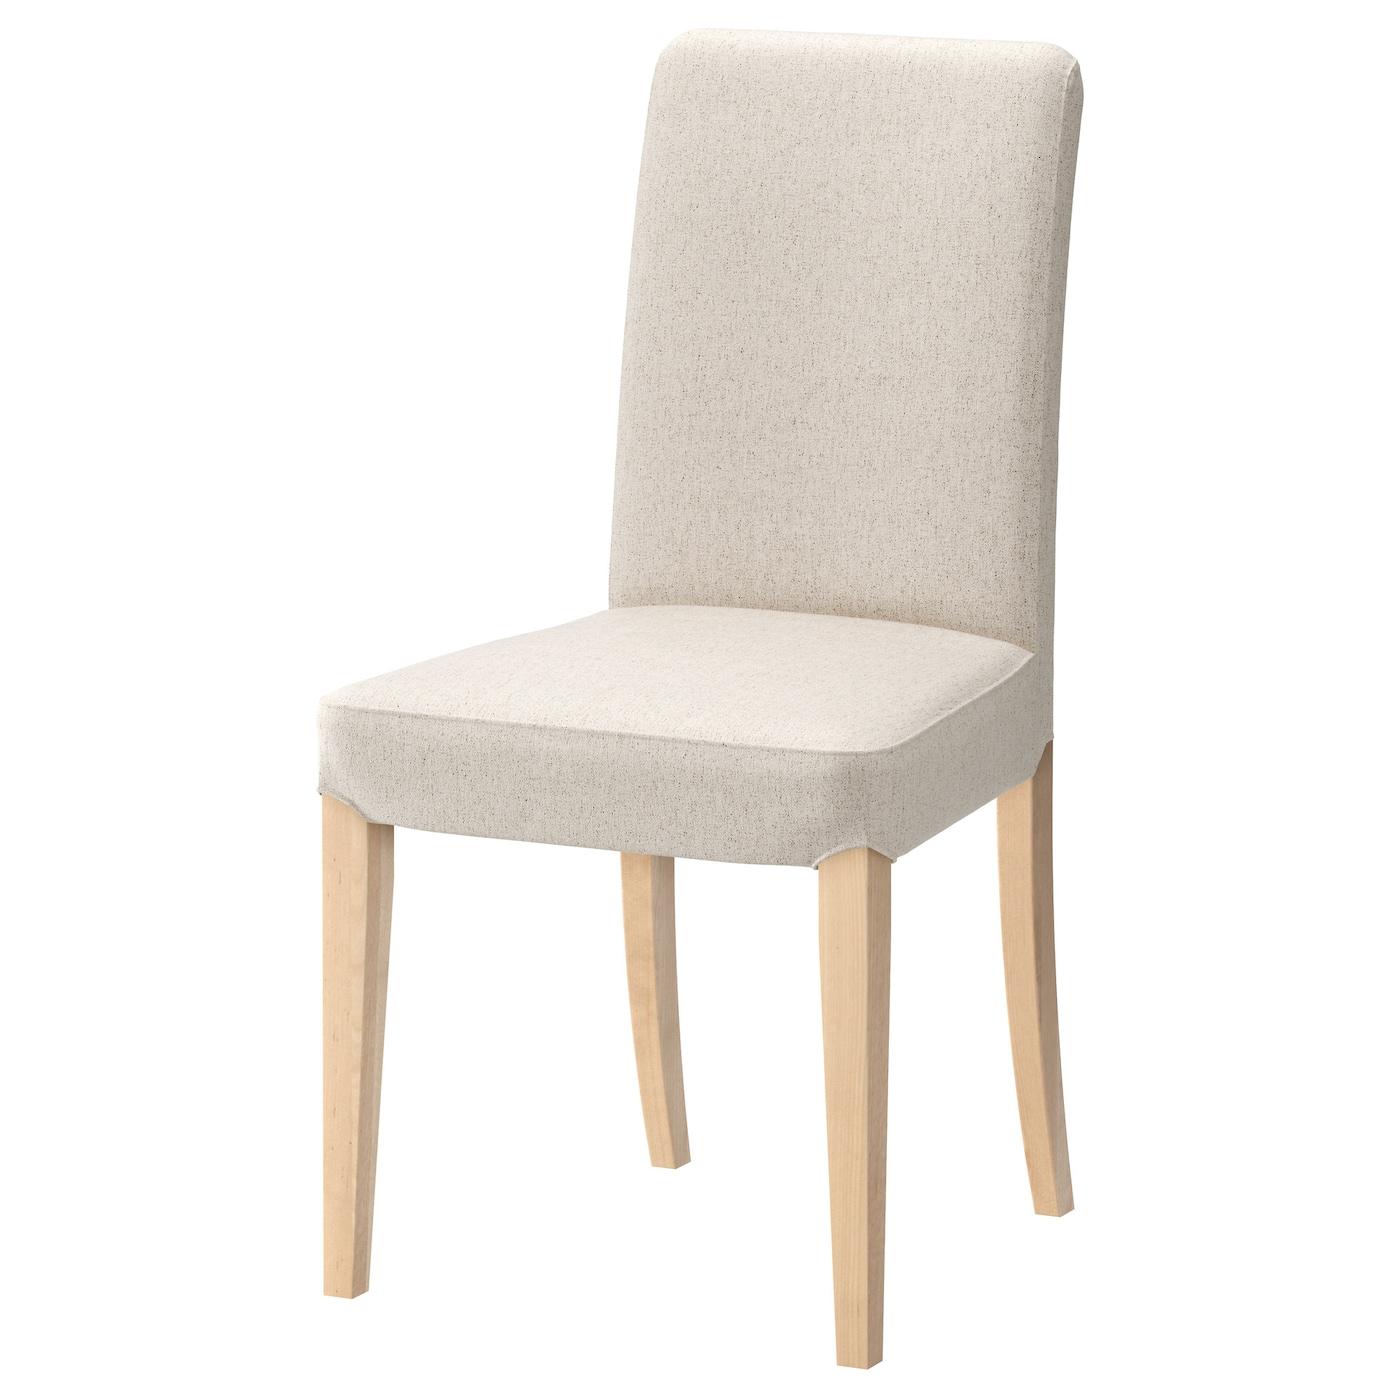 Henriksdal chair birch linneryd natural ikea - Sedia sospesa ikea ...